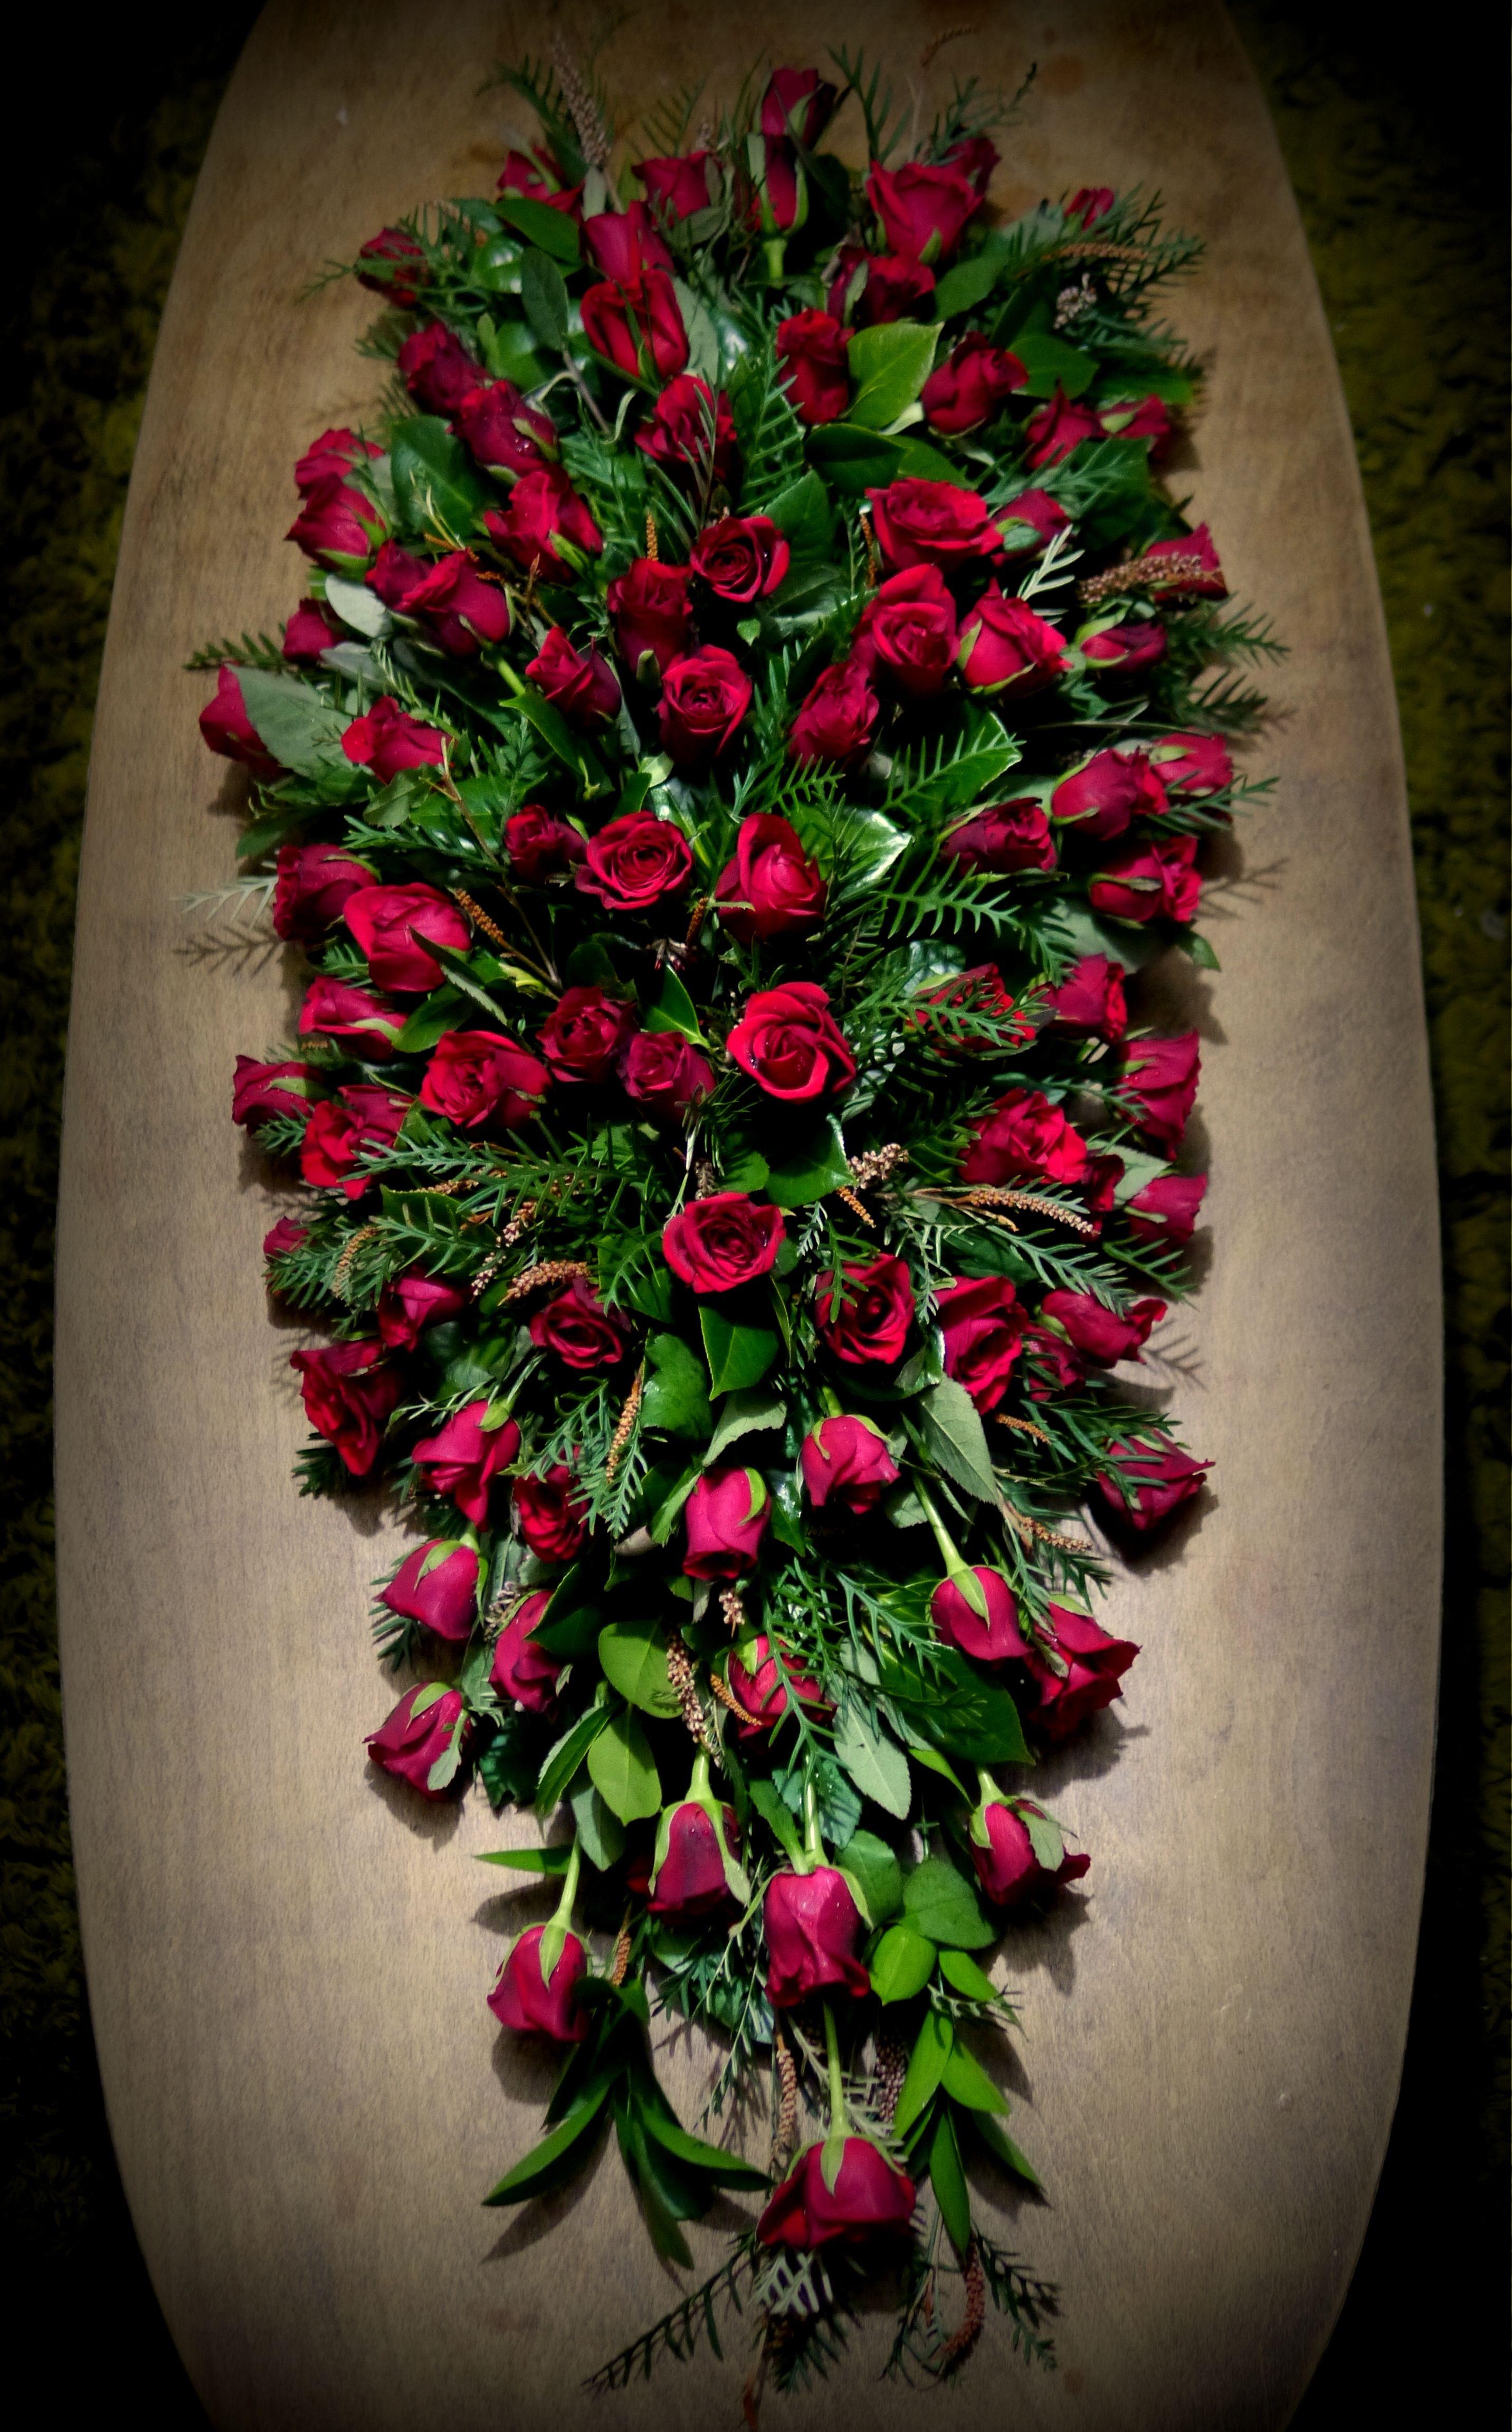 Gorgeous red rose funeral casket spray arrangements pinterest gorgeous red rose funeral casket spray funeral flower arrangements funeral flowers casket flowers izmirmasajfo